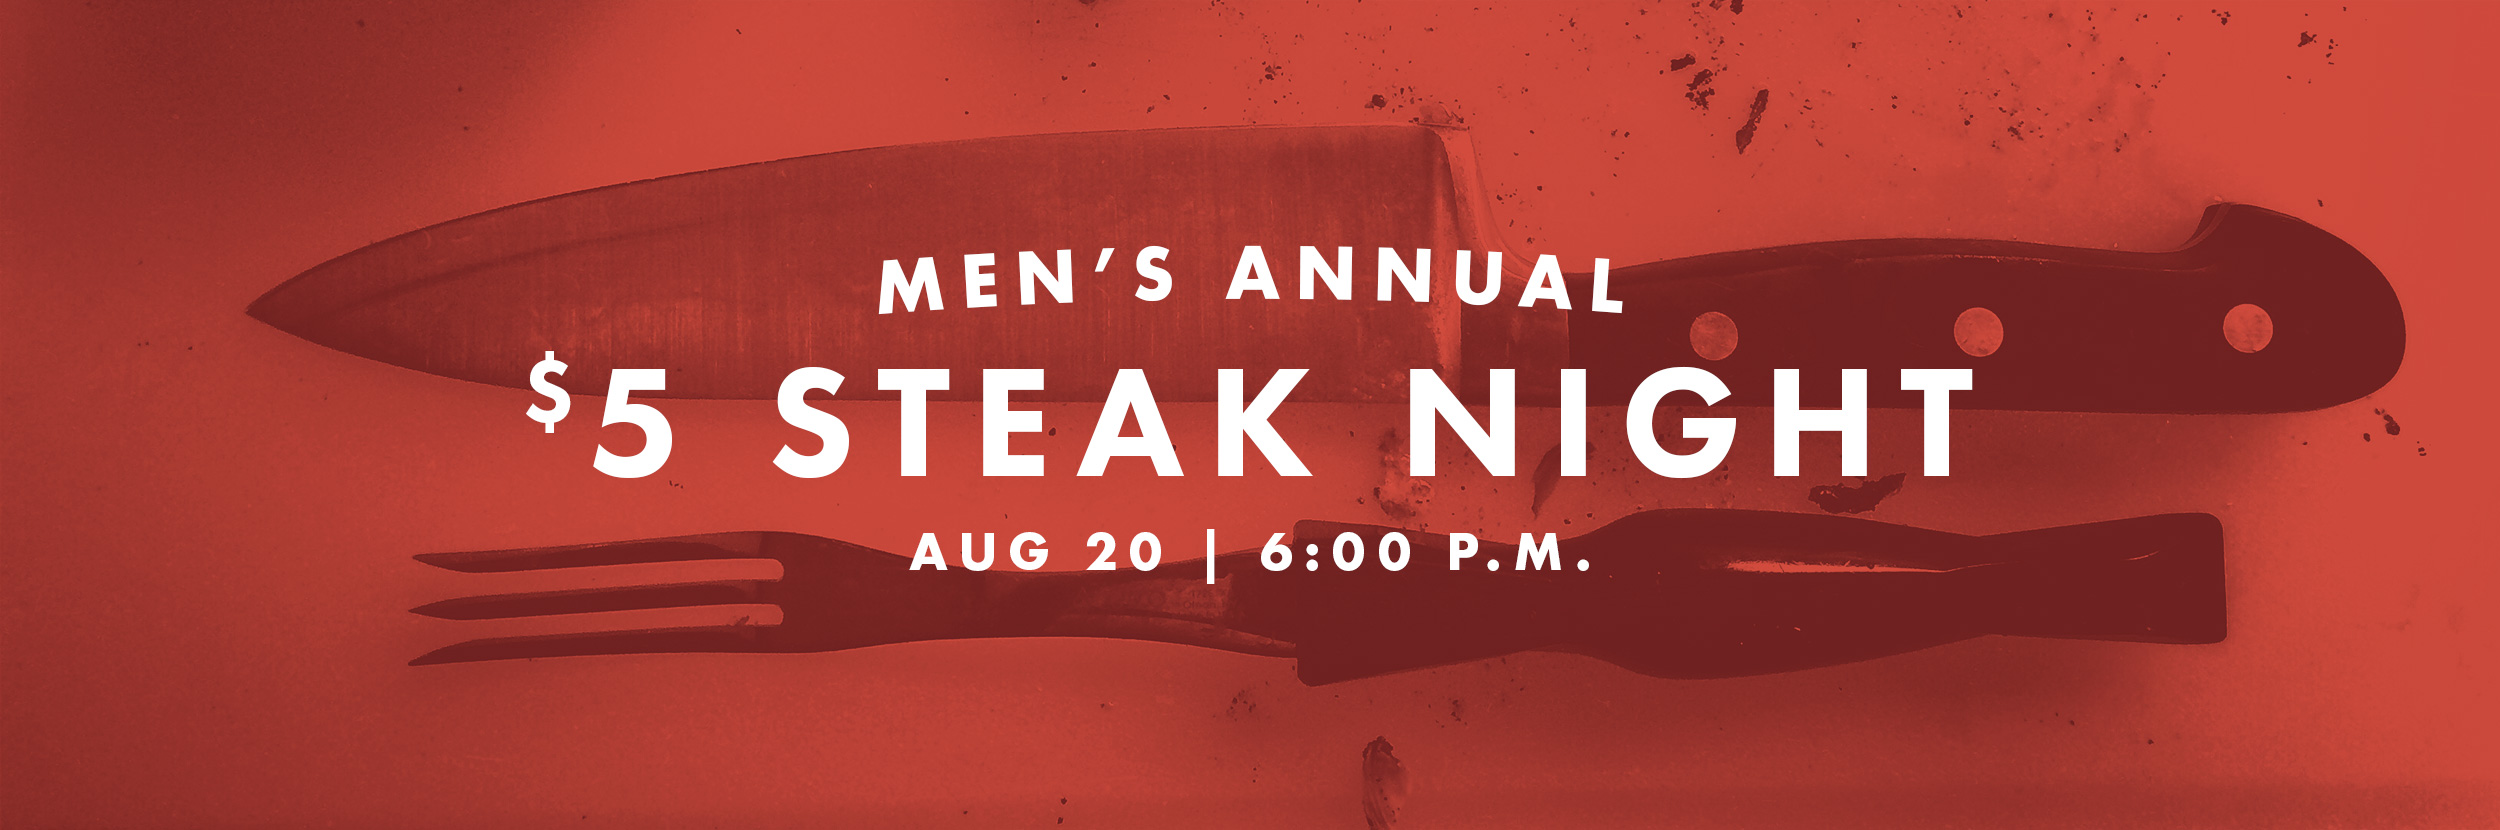 steak-night-banner.jpg